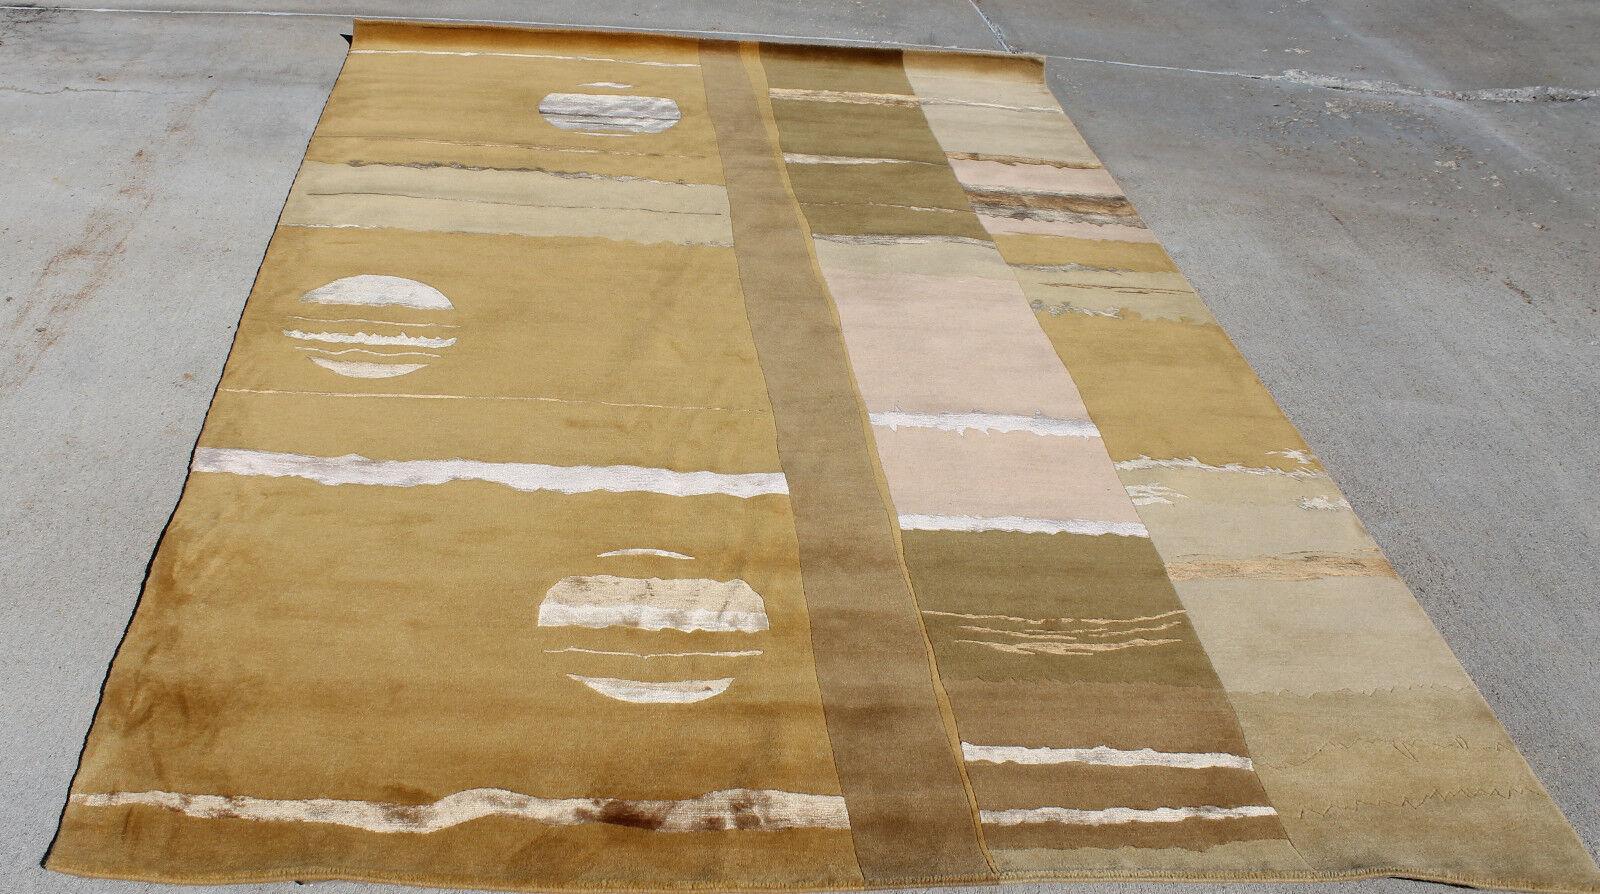 R11575 Gorgeous Eearth Tone Farbes Tibetan Tibetan Tibetan Area Rug 6' X 9' Handmade In Nepal 45e88a